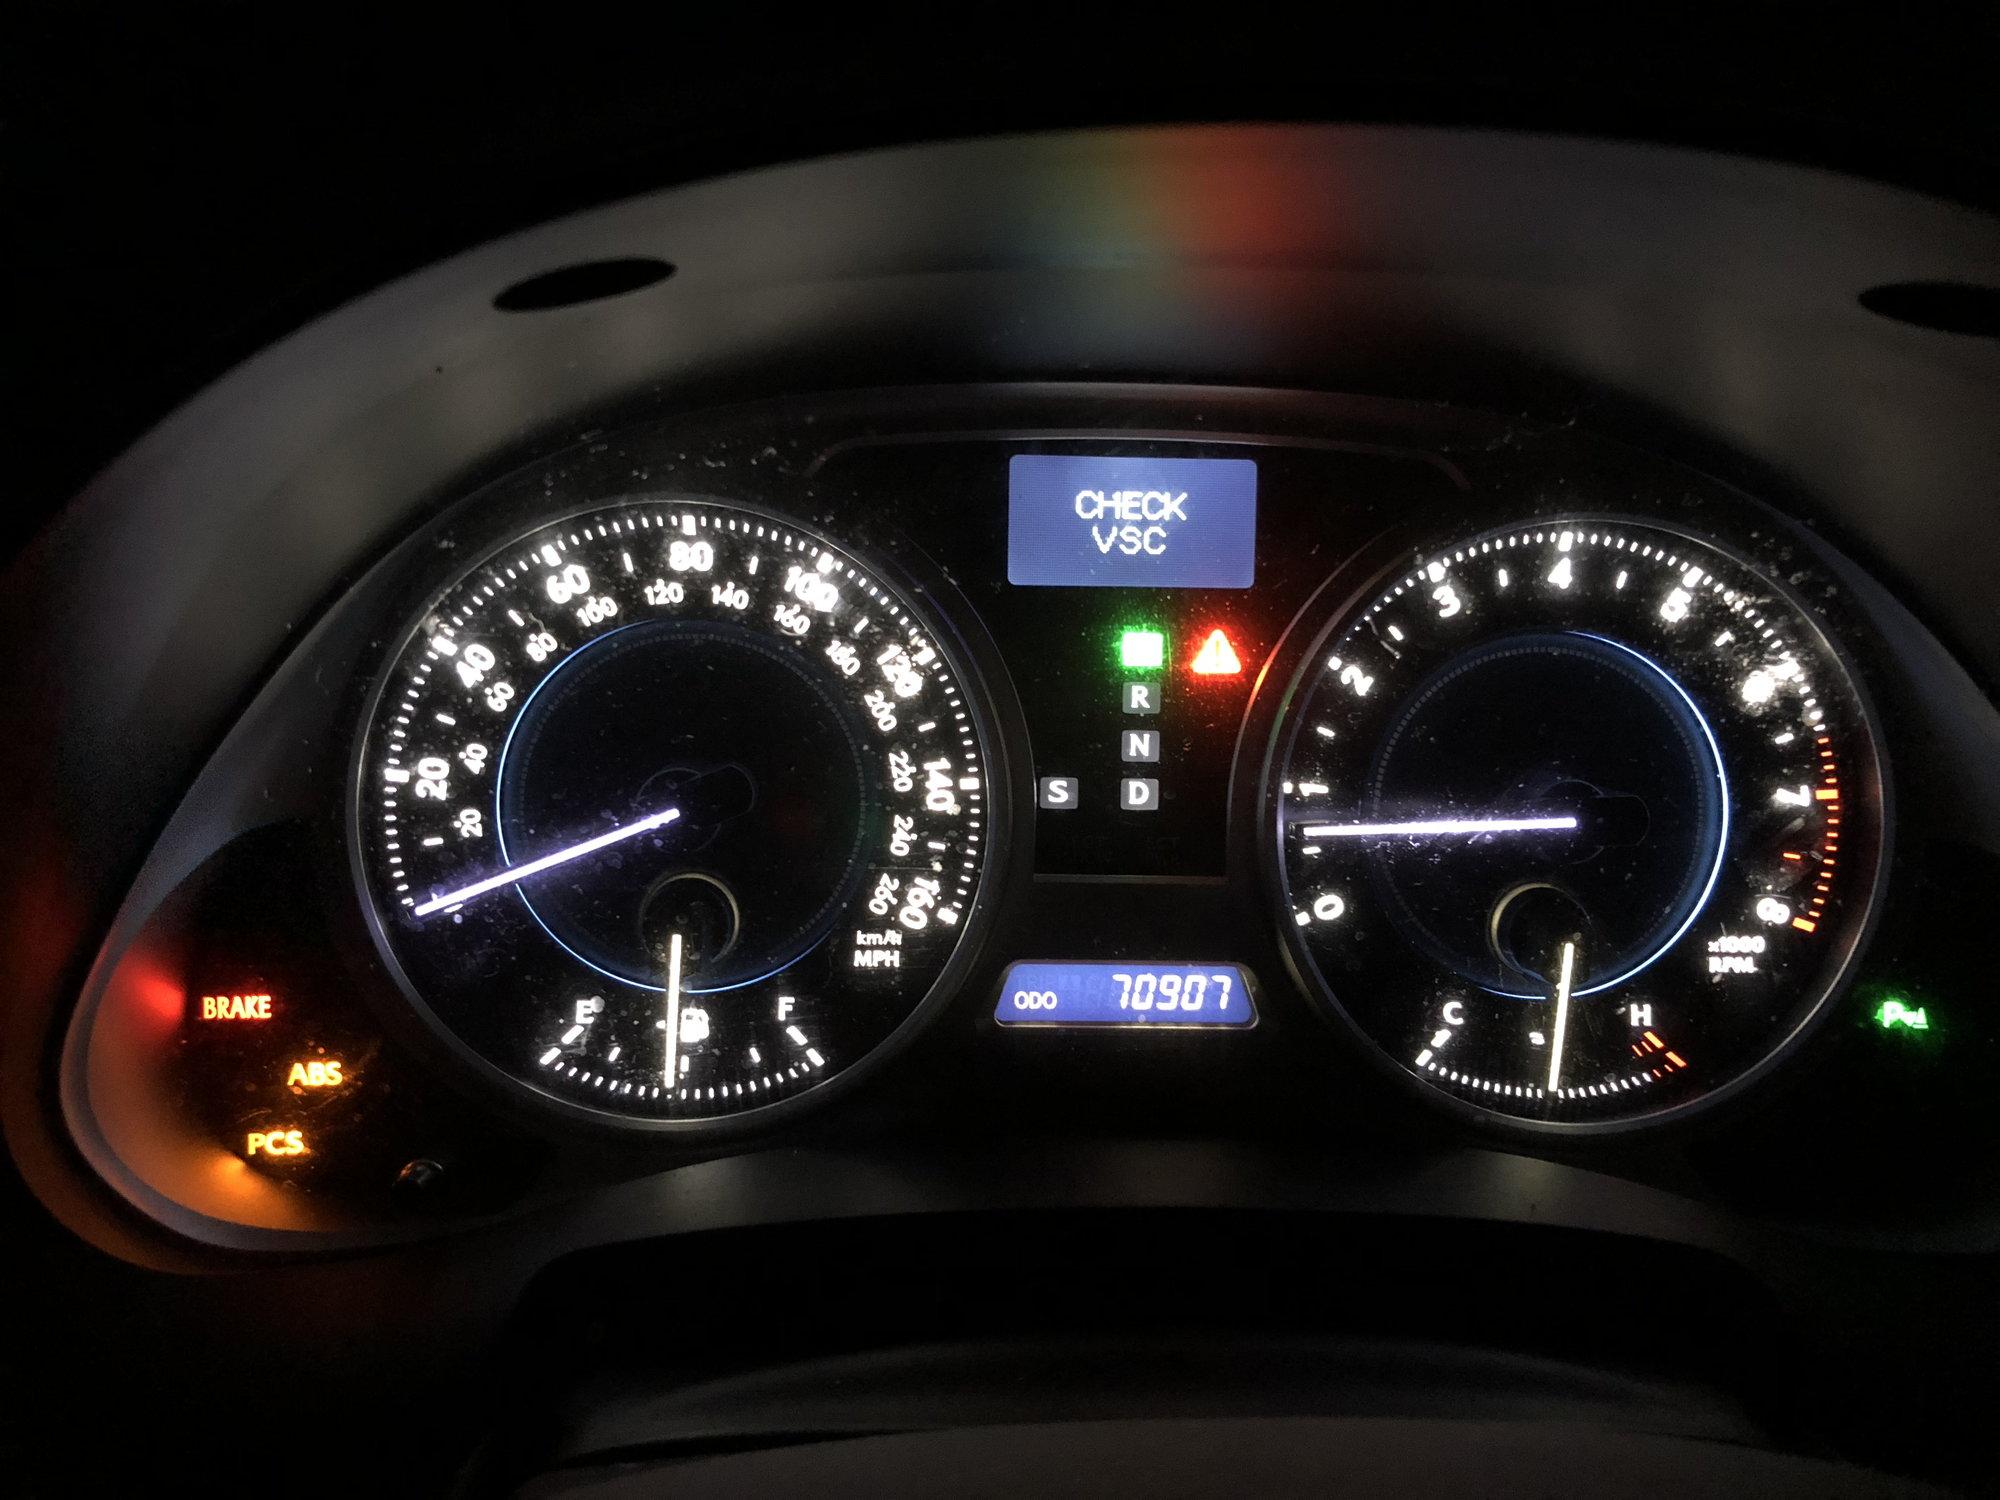 Check VSC, PCS, ABS, Brake Lights. No Check Engine light.